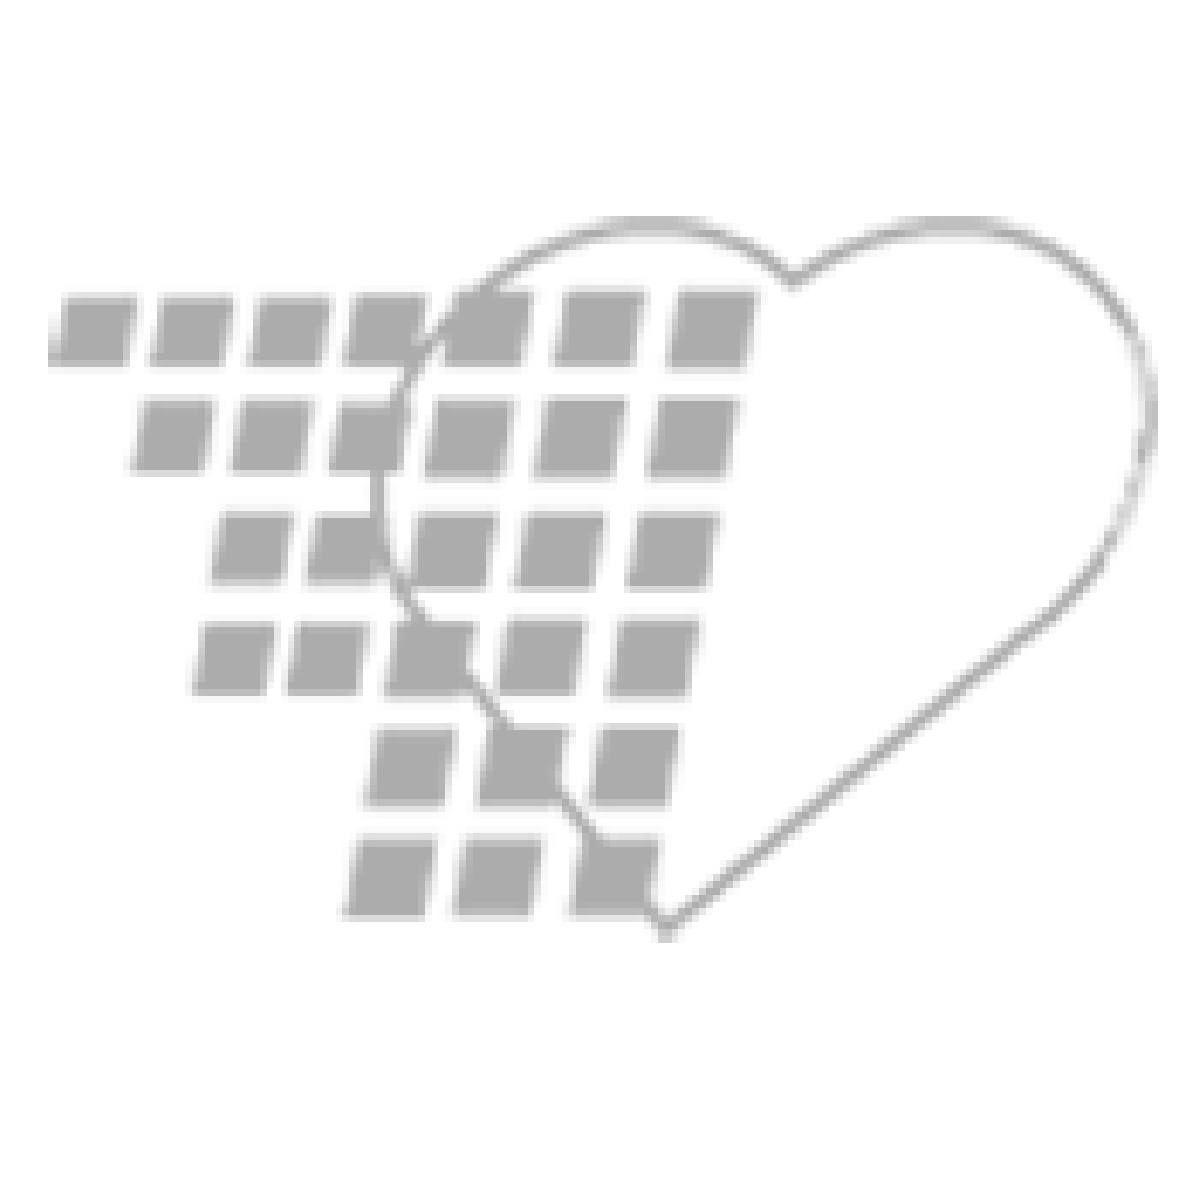 06-69-0166 - Pocket Nurse® Pill Counting Tray